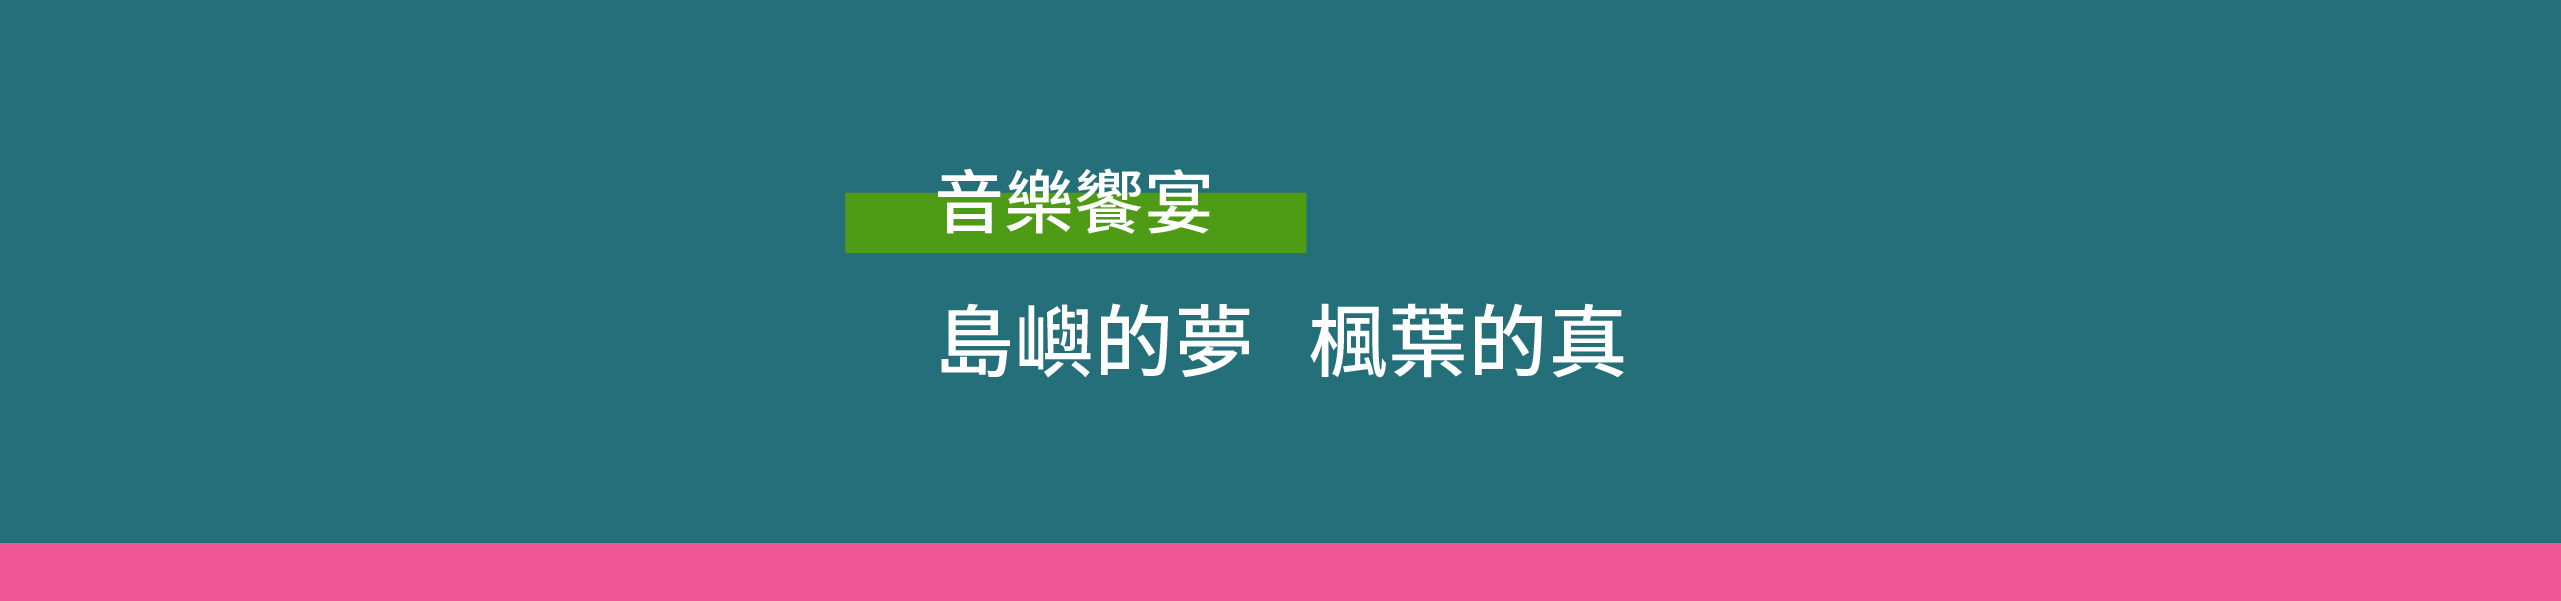 TAIWANfest Letterhead - Concert